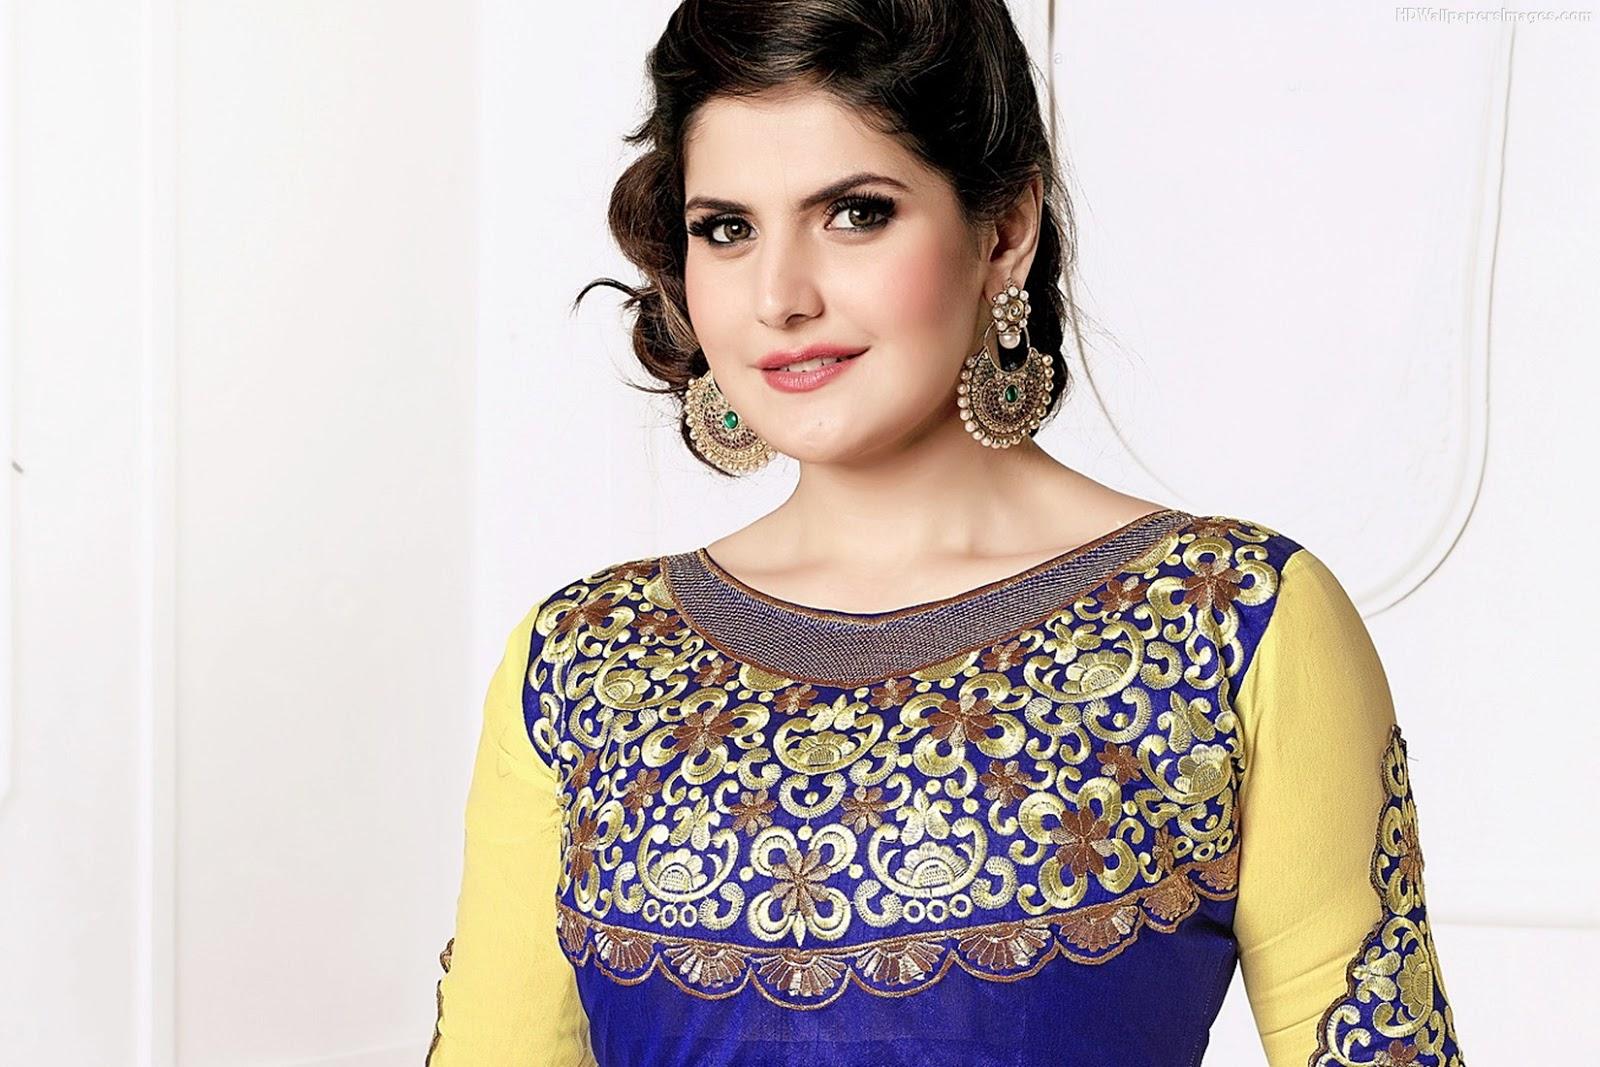 Dimple Girl Wallpaper Zarine Khan Biography Wiki Dob Age Height Weight